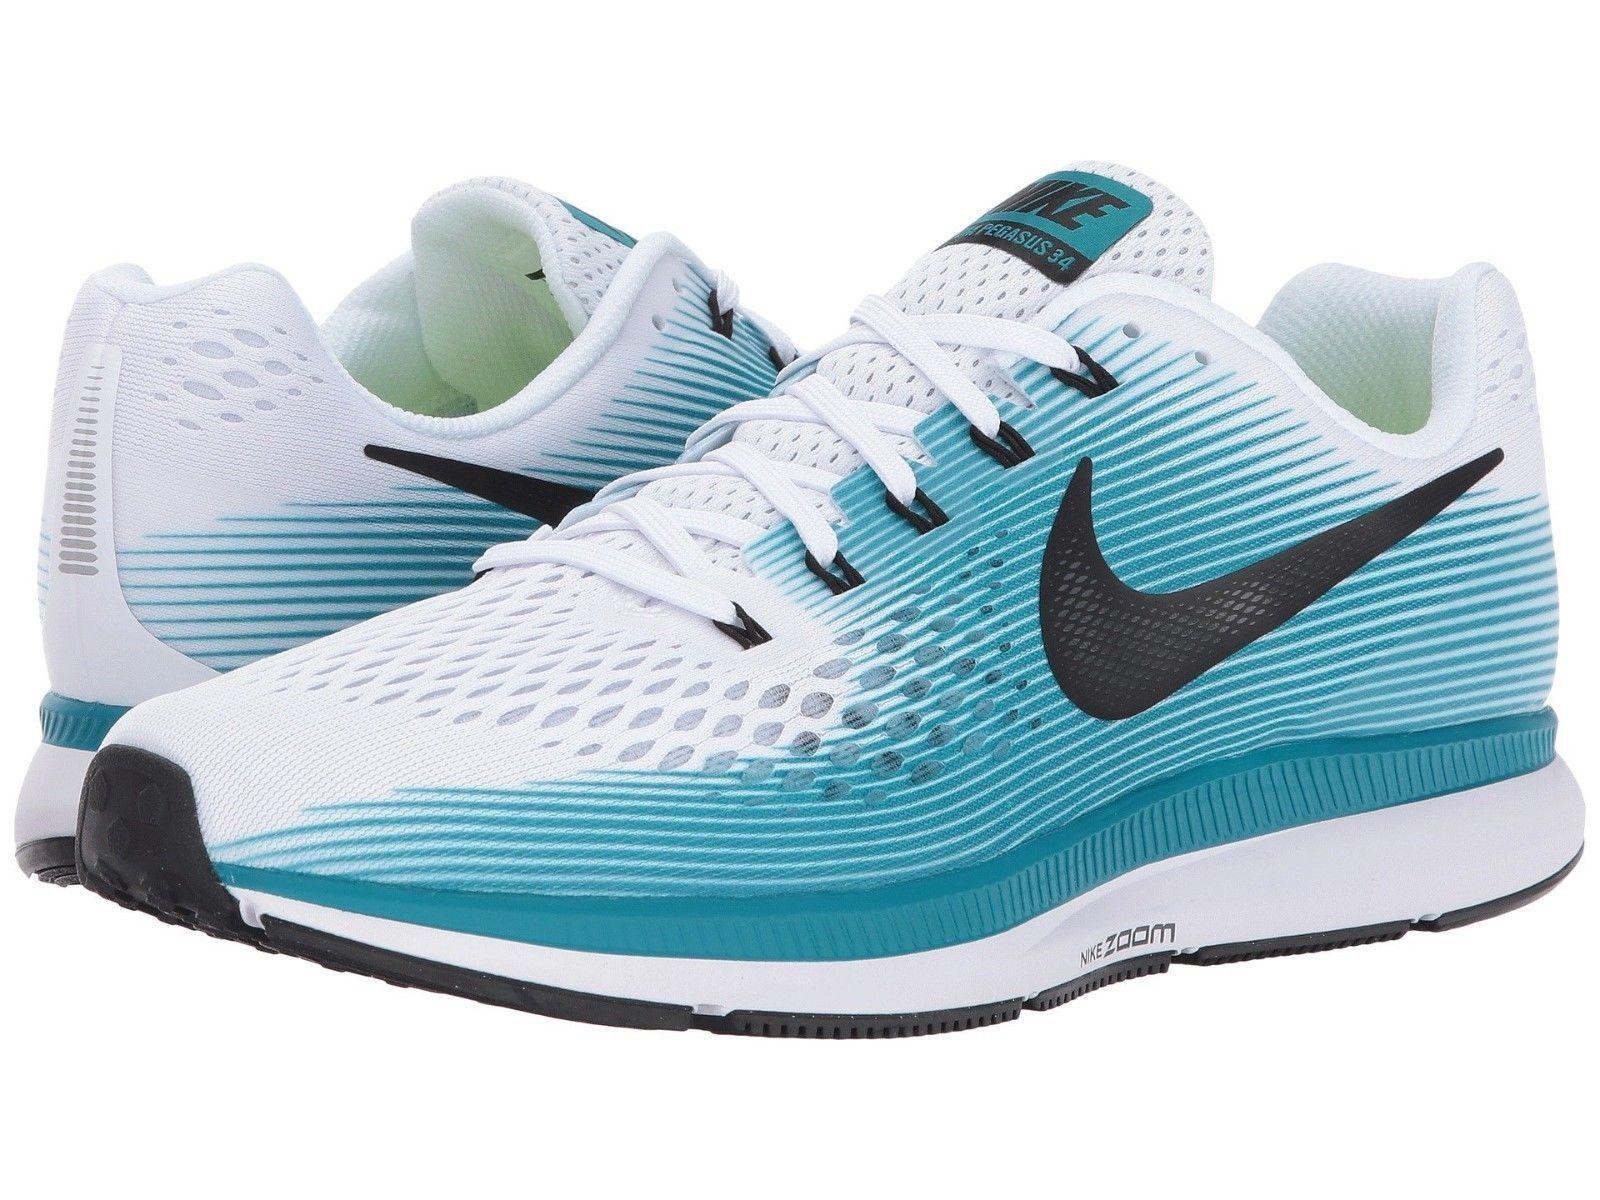 New Nike Men's Air Zoom Pegasus white 34 Size 7 - white Pegasus black blue running 880555-101 3ae309